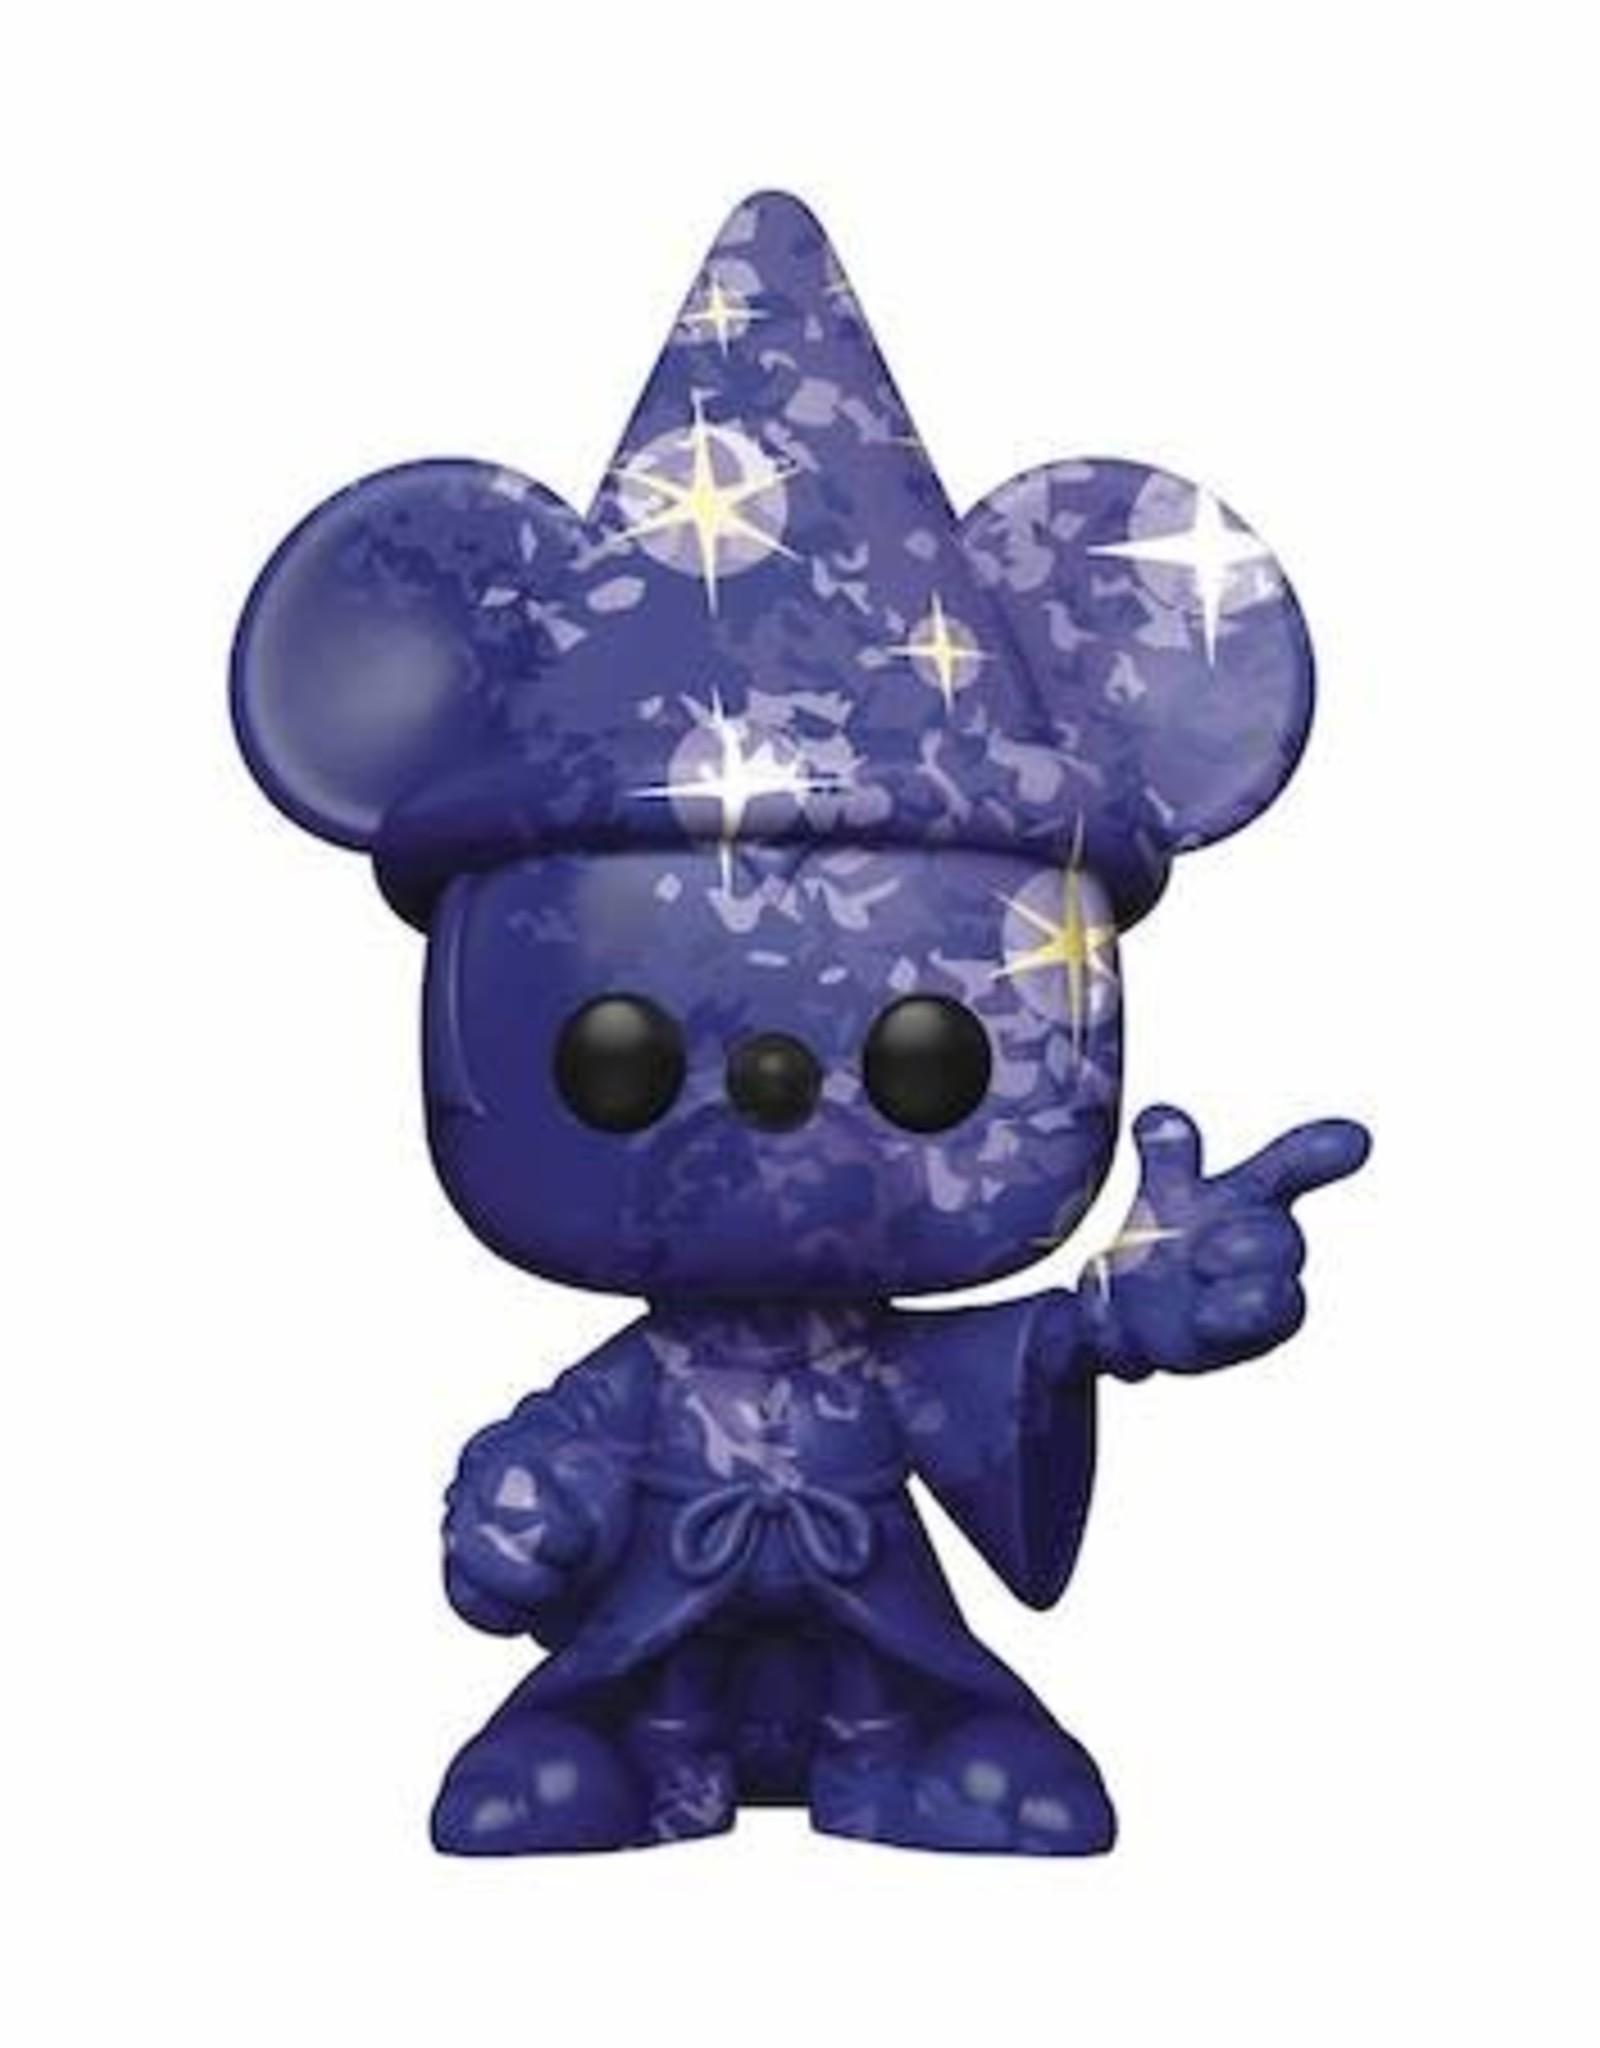 Funko Pop Art Series Disney Fantasia 80th Mickey 1 Vinyl Fig